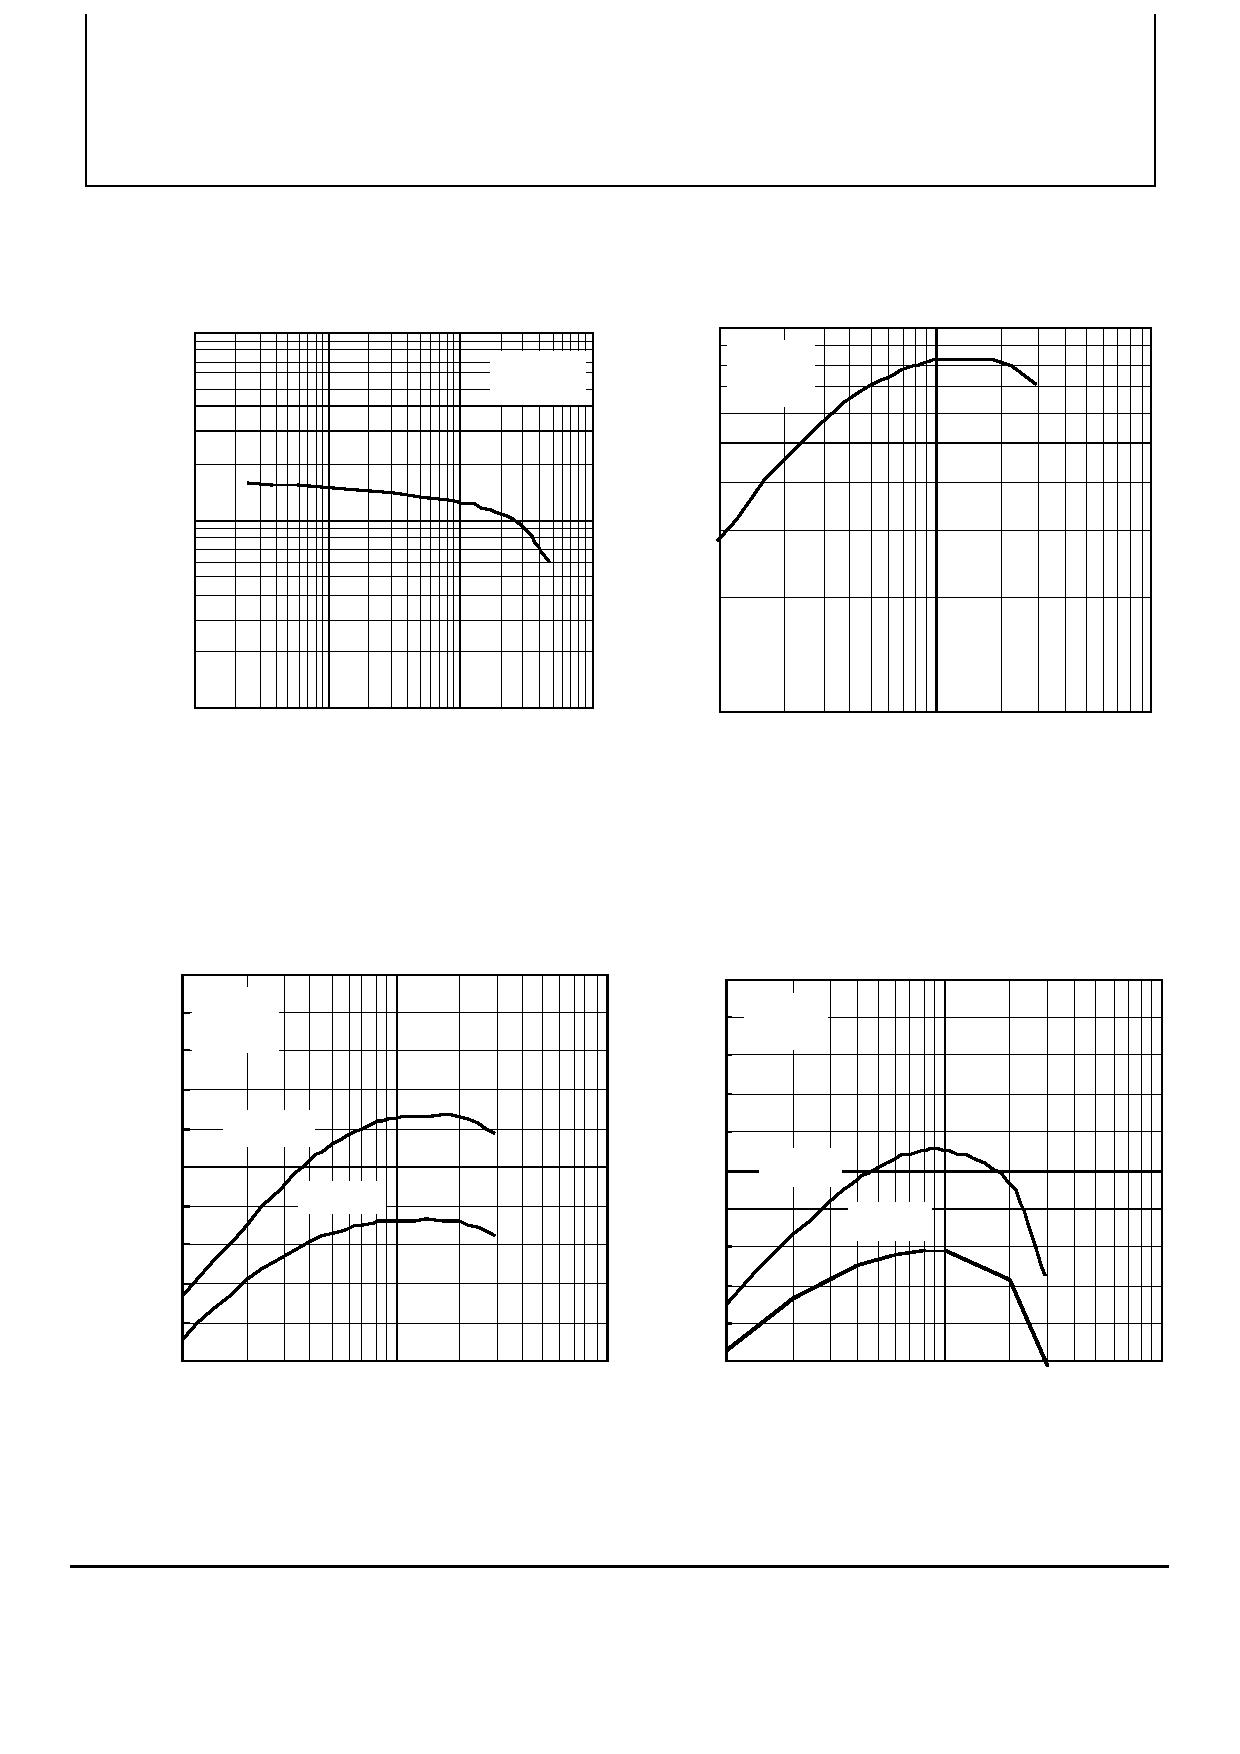 2SC5883 pdf, schematic